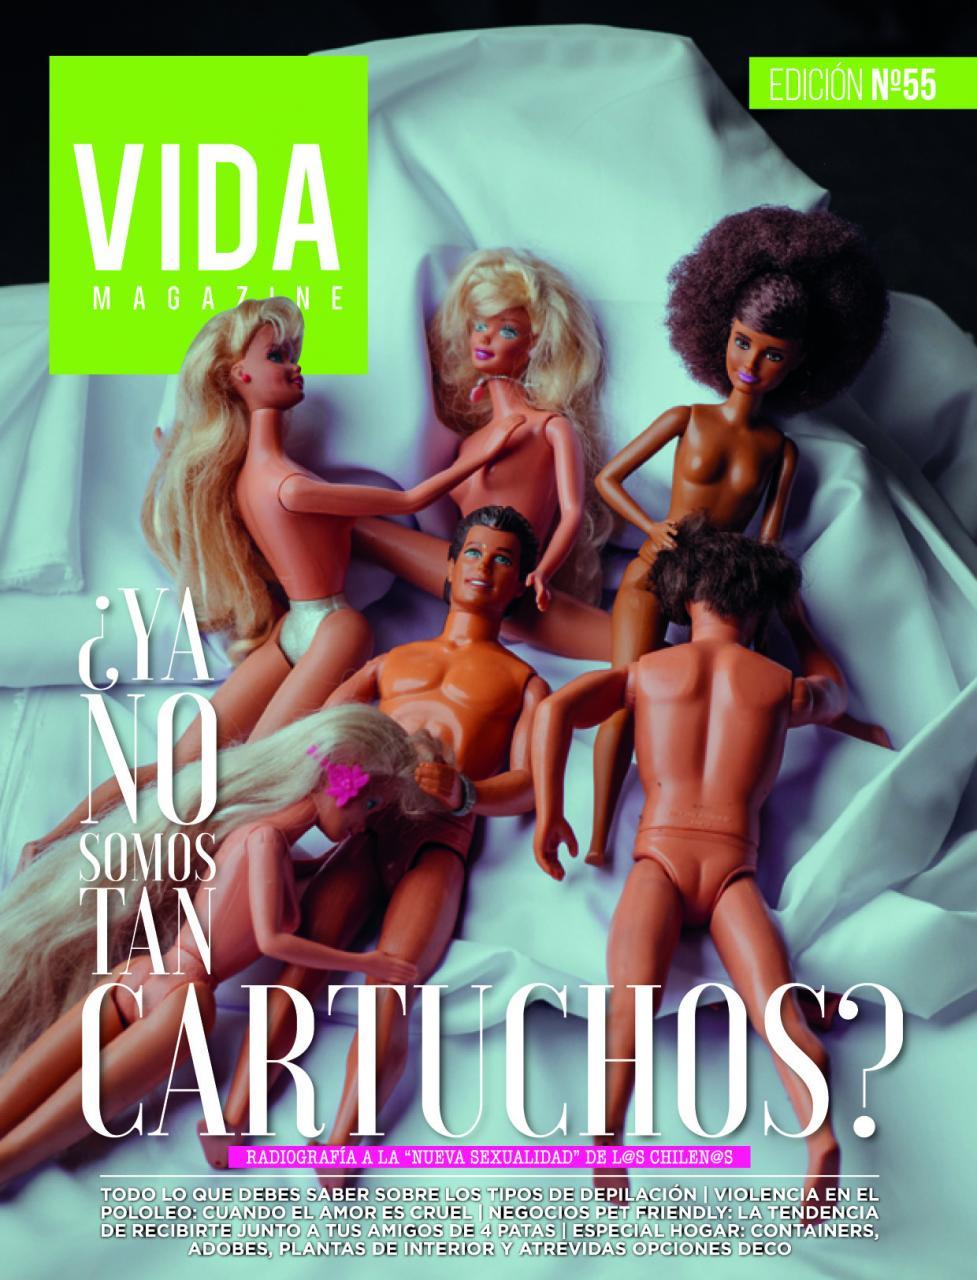 vida-magazine-edicion-n-55